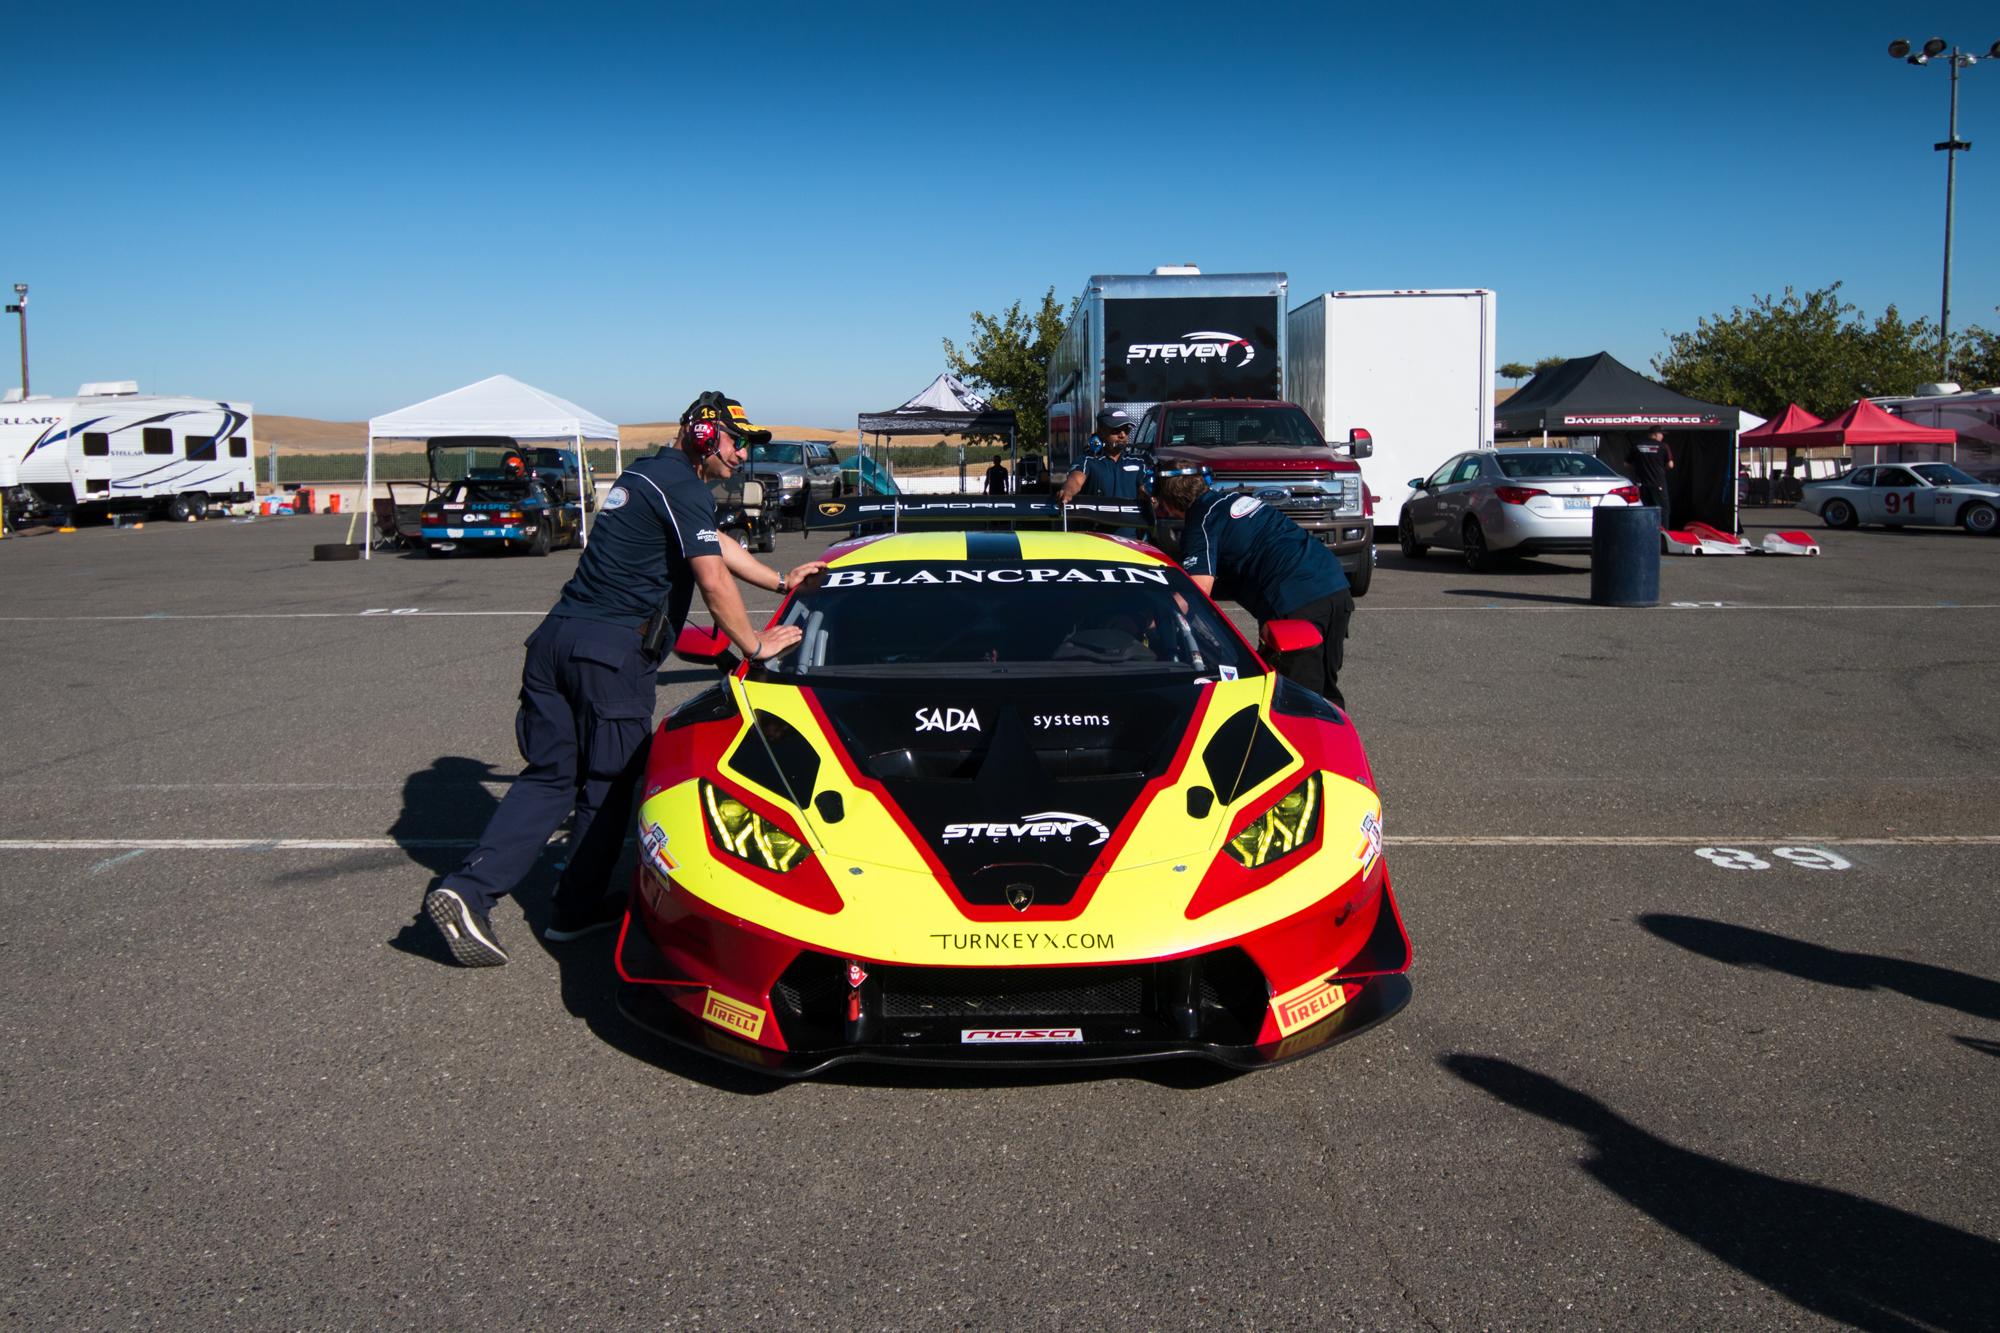 Steven-Racing-20130206-44846.jpg